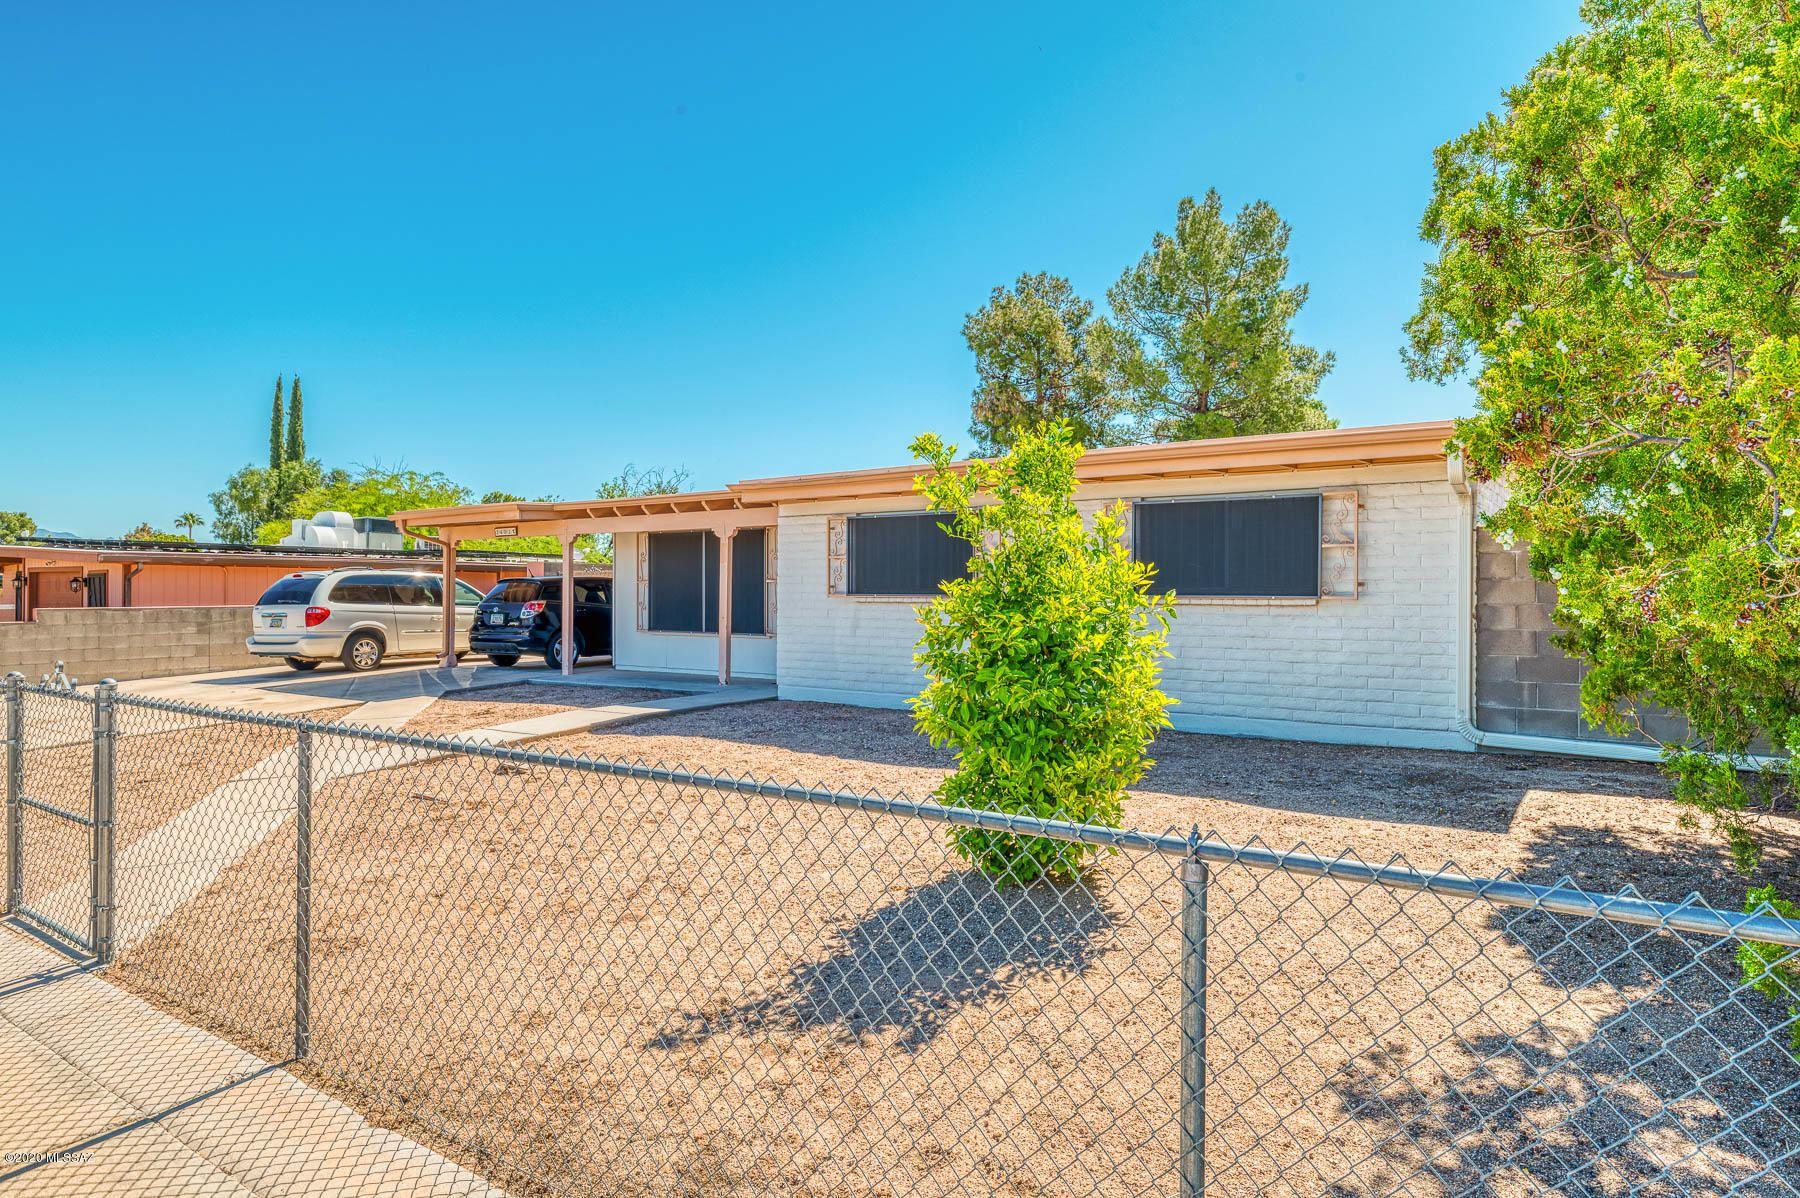 3401 S Champlain Avenue, Tucson, AZ 85730 - #: 22011670